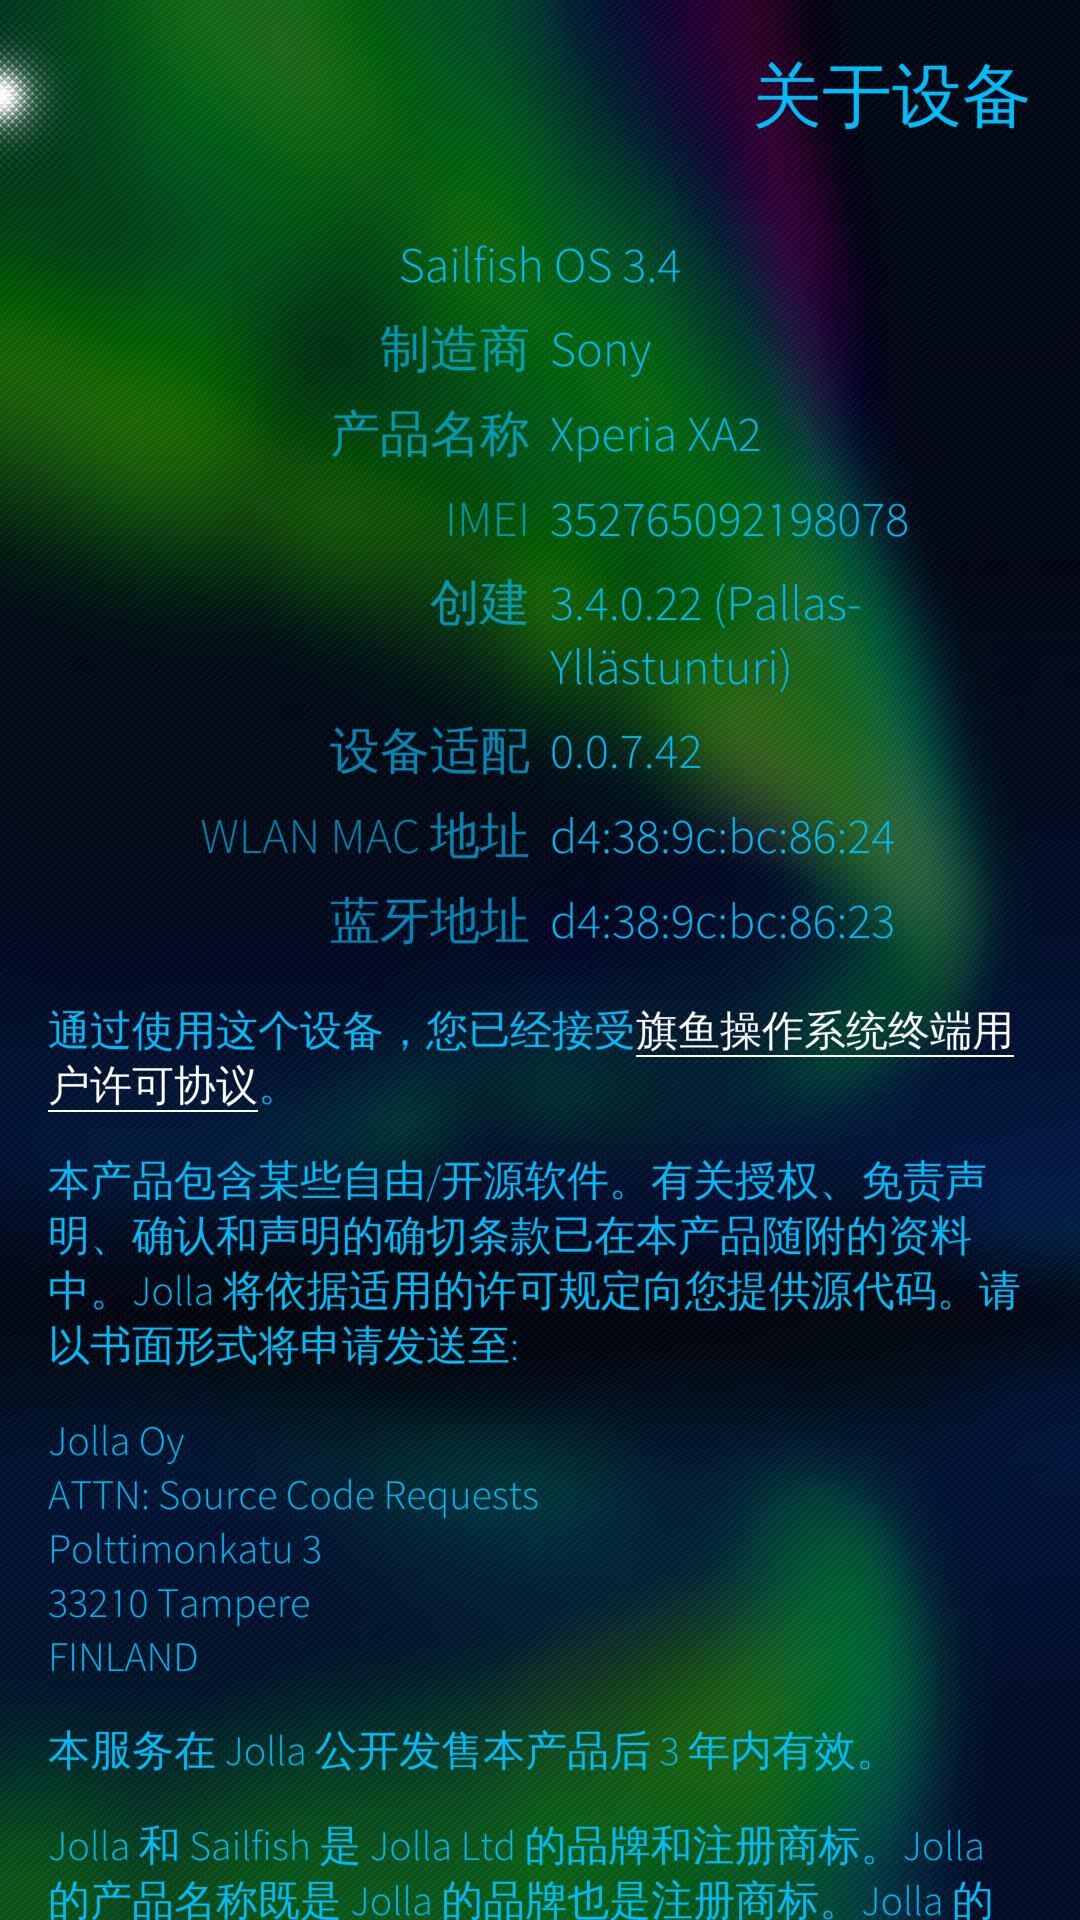 屏幕截图_20200929_002_edit.png